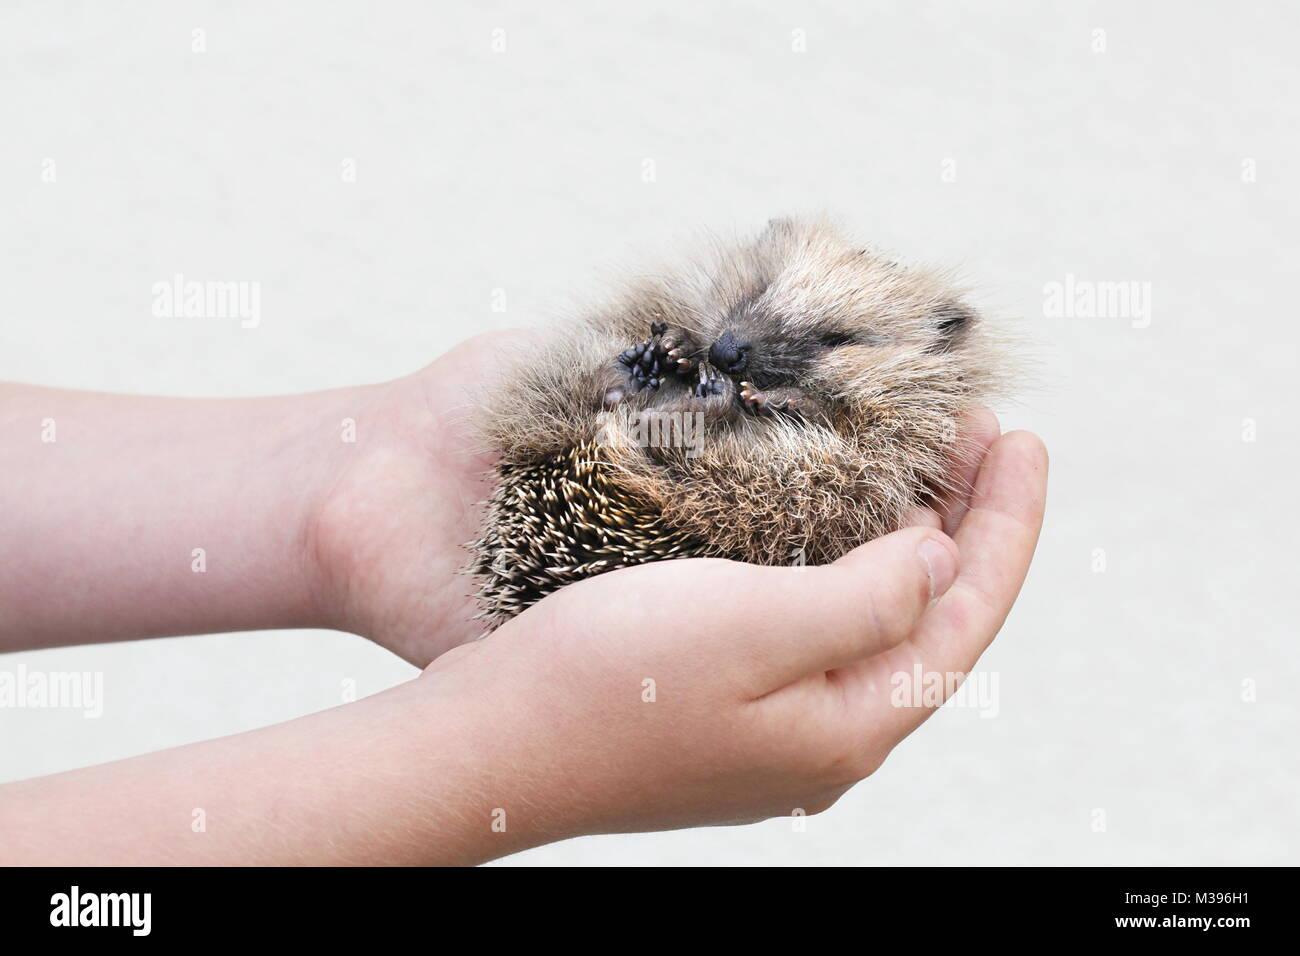 European hedgehog cub - Stock Image